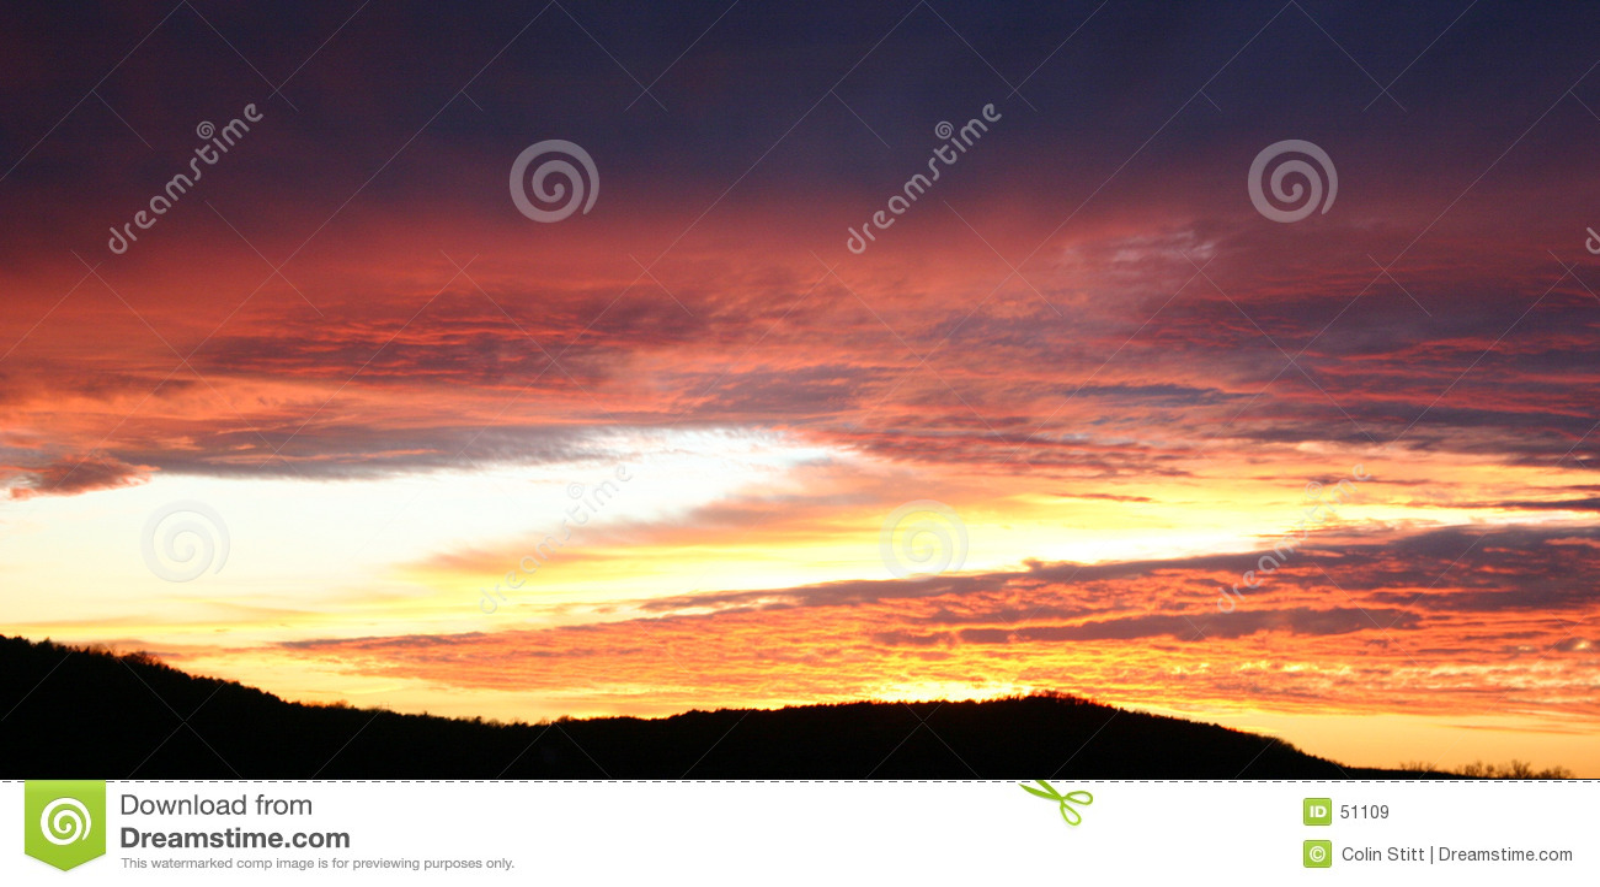 Download χρυσό ηλιοβασίλεμα στοκ εικόνα. εικόνα από φυσικός, ουρανός - 51109